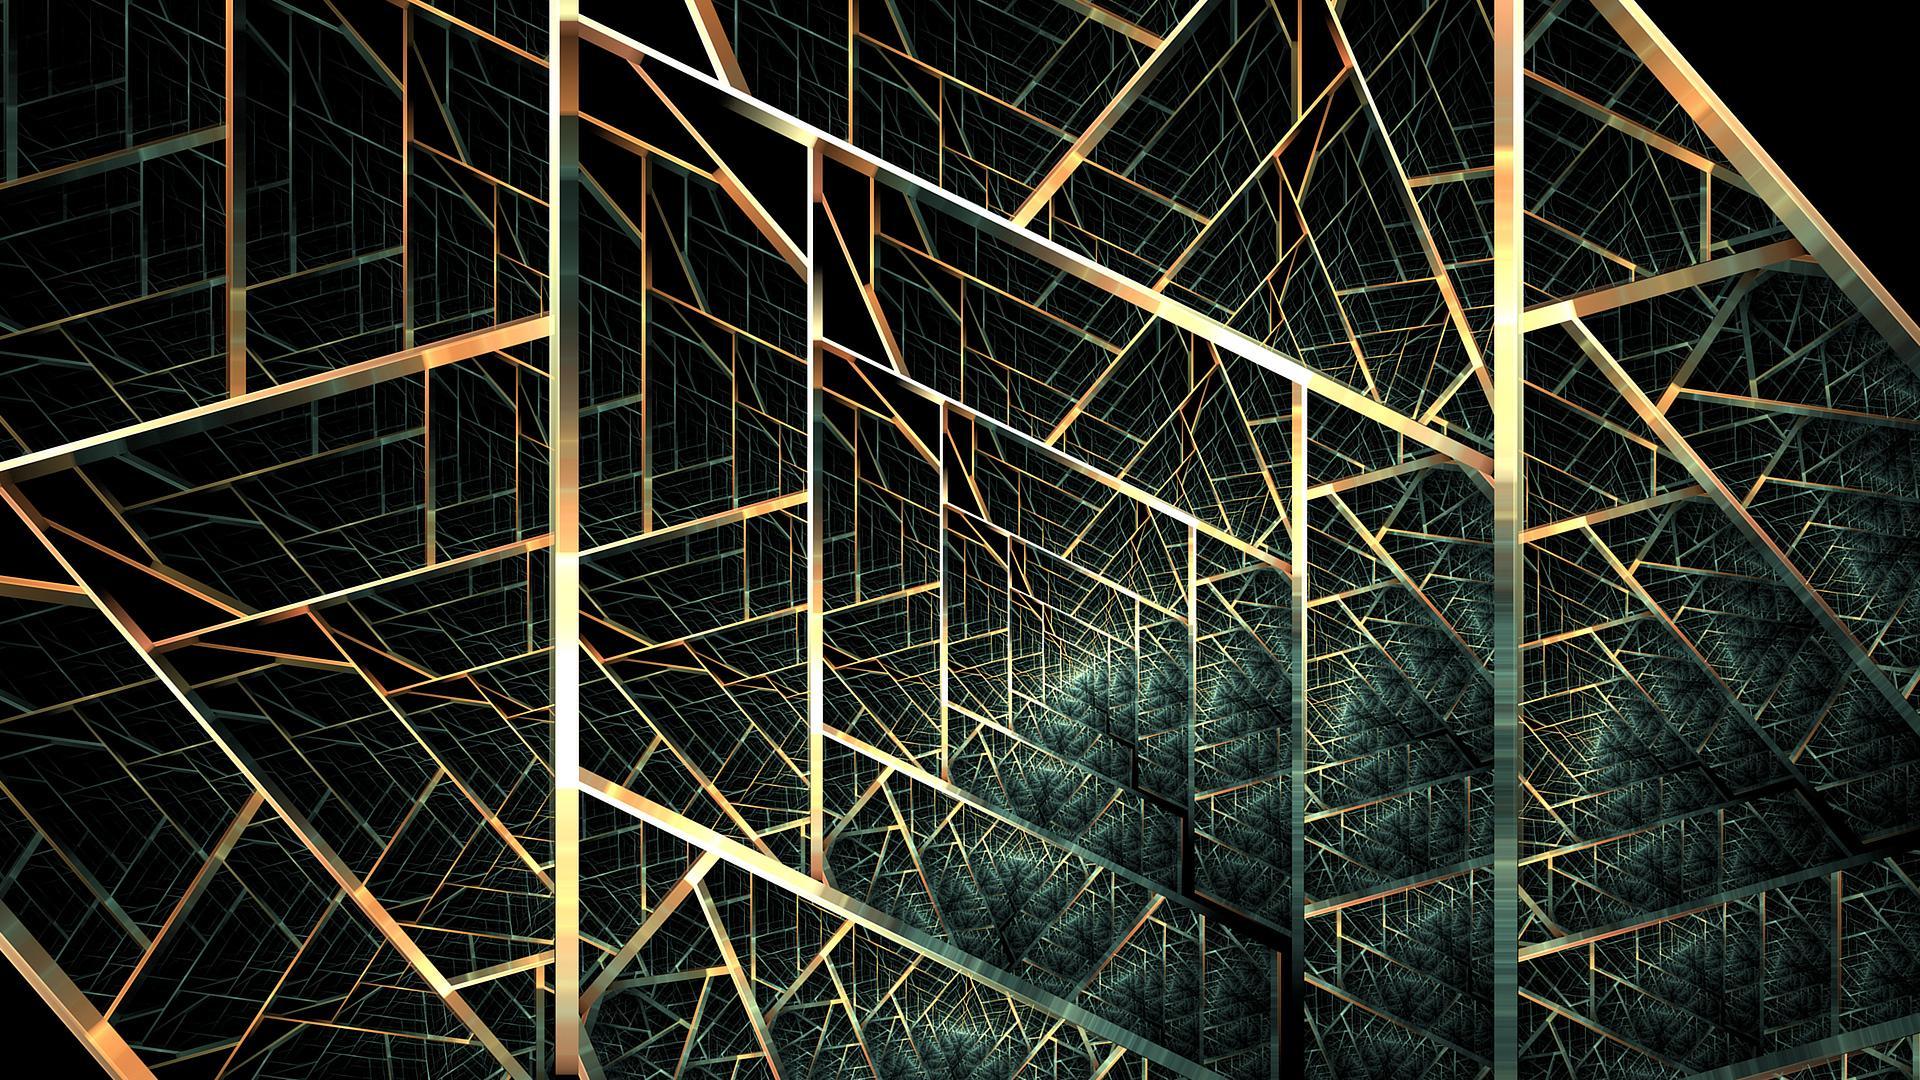 fractal wallpaper 1080p wallpaper desktop hd